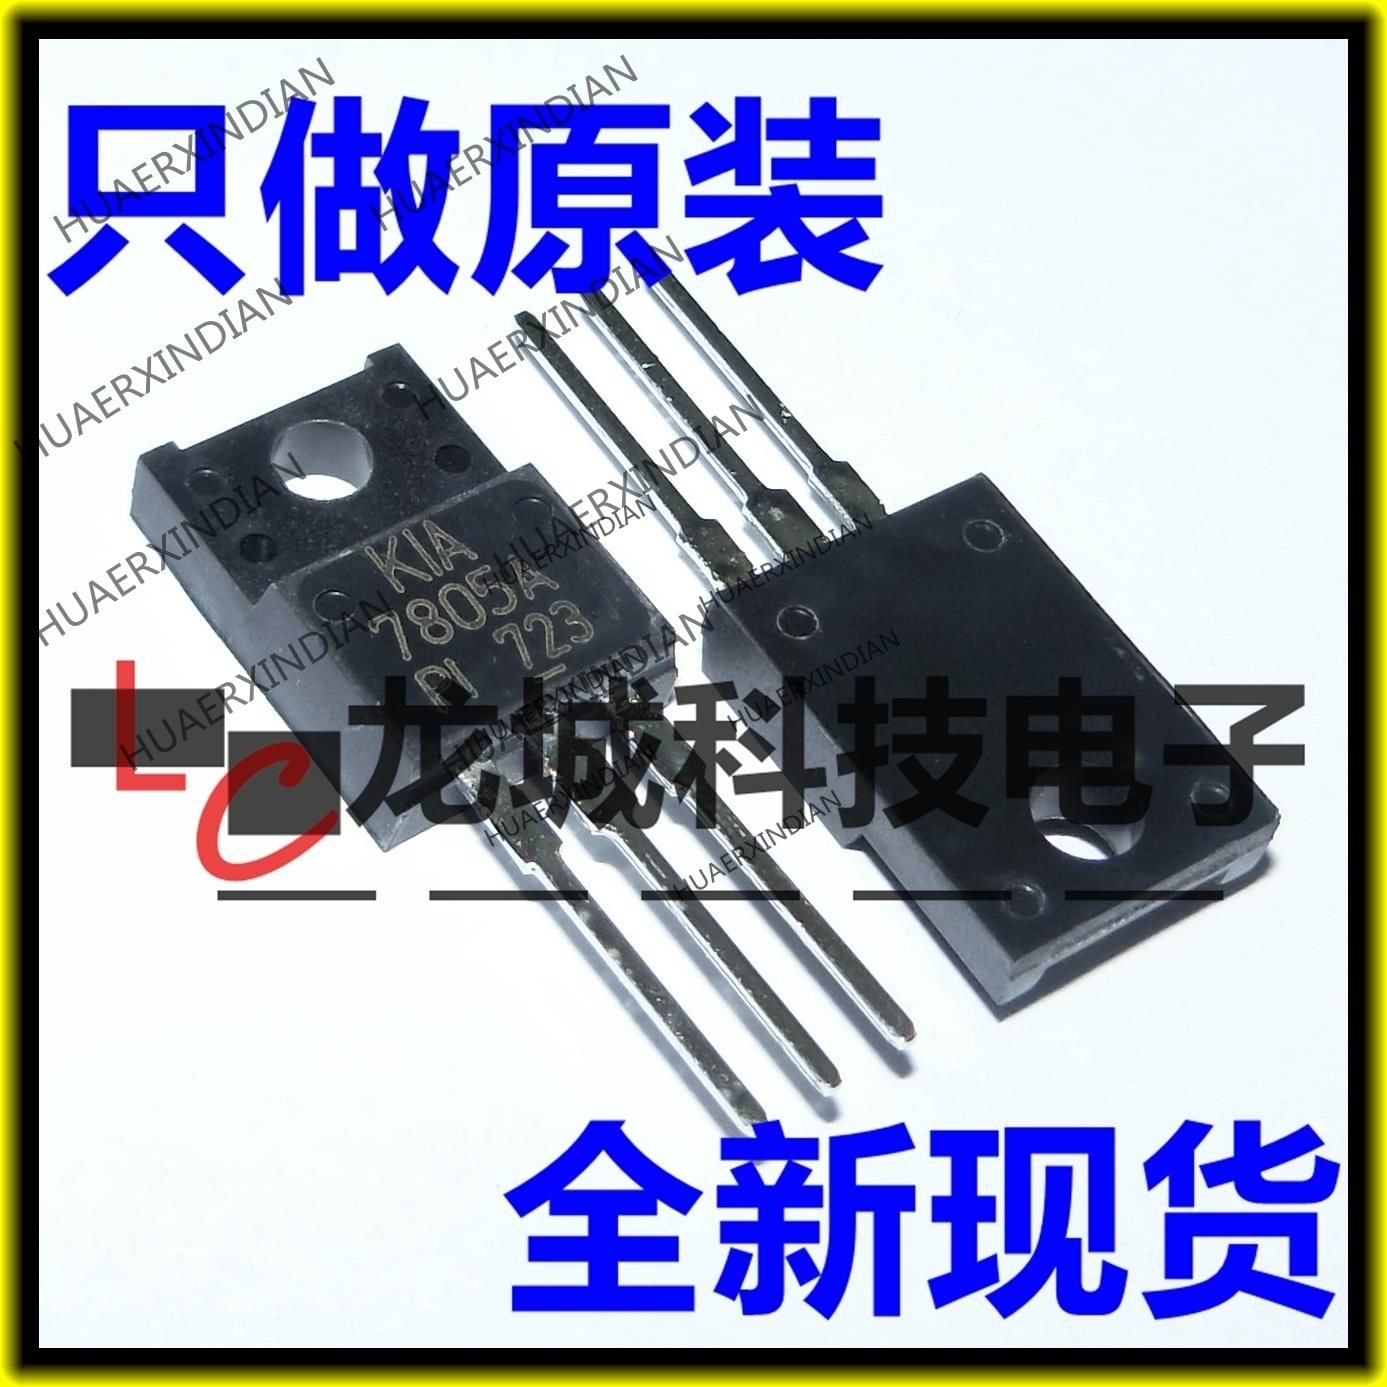 10 unids/lote nueva KIA7805API KIA7805A 1A 5V TO-220F en stock